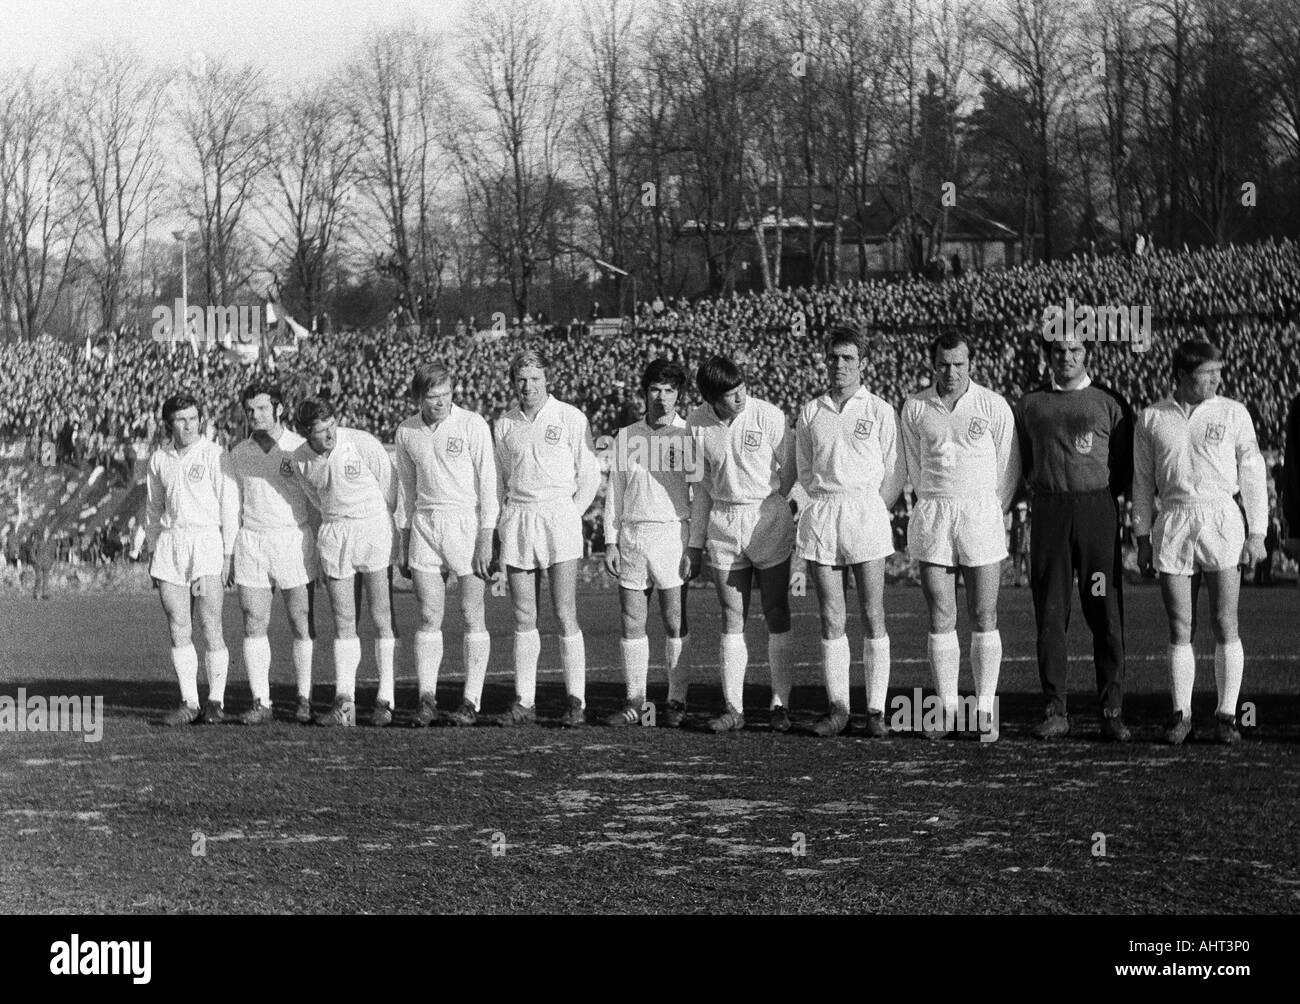 football, Regionalliga West, 1970/1971, Stadium am Zoo in Wuppertal, Wuppertaler SV versus Fortuna Duesseldorf 1:1, team photograph, shot of the Wuppertal team, f.l.t.r. Gustav Jung, Emil Meisen, Guenter Proepper, Manfred Cremer, Bernhard Hermes, Heinz Di - Stock Image